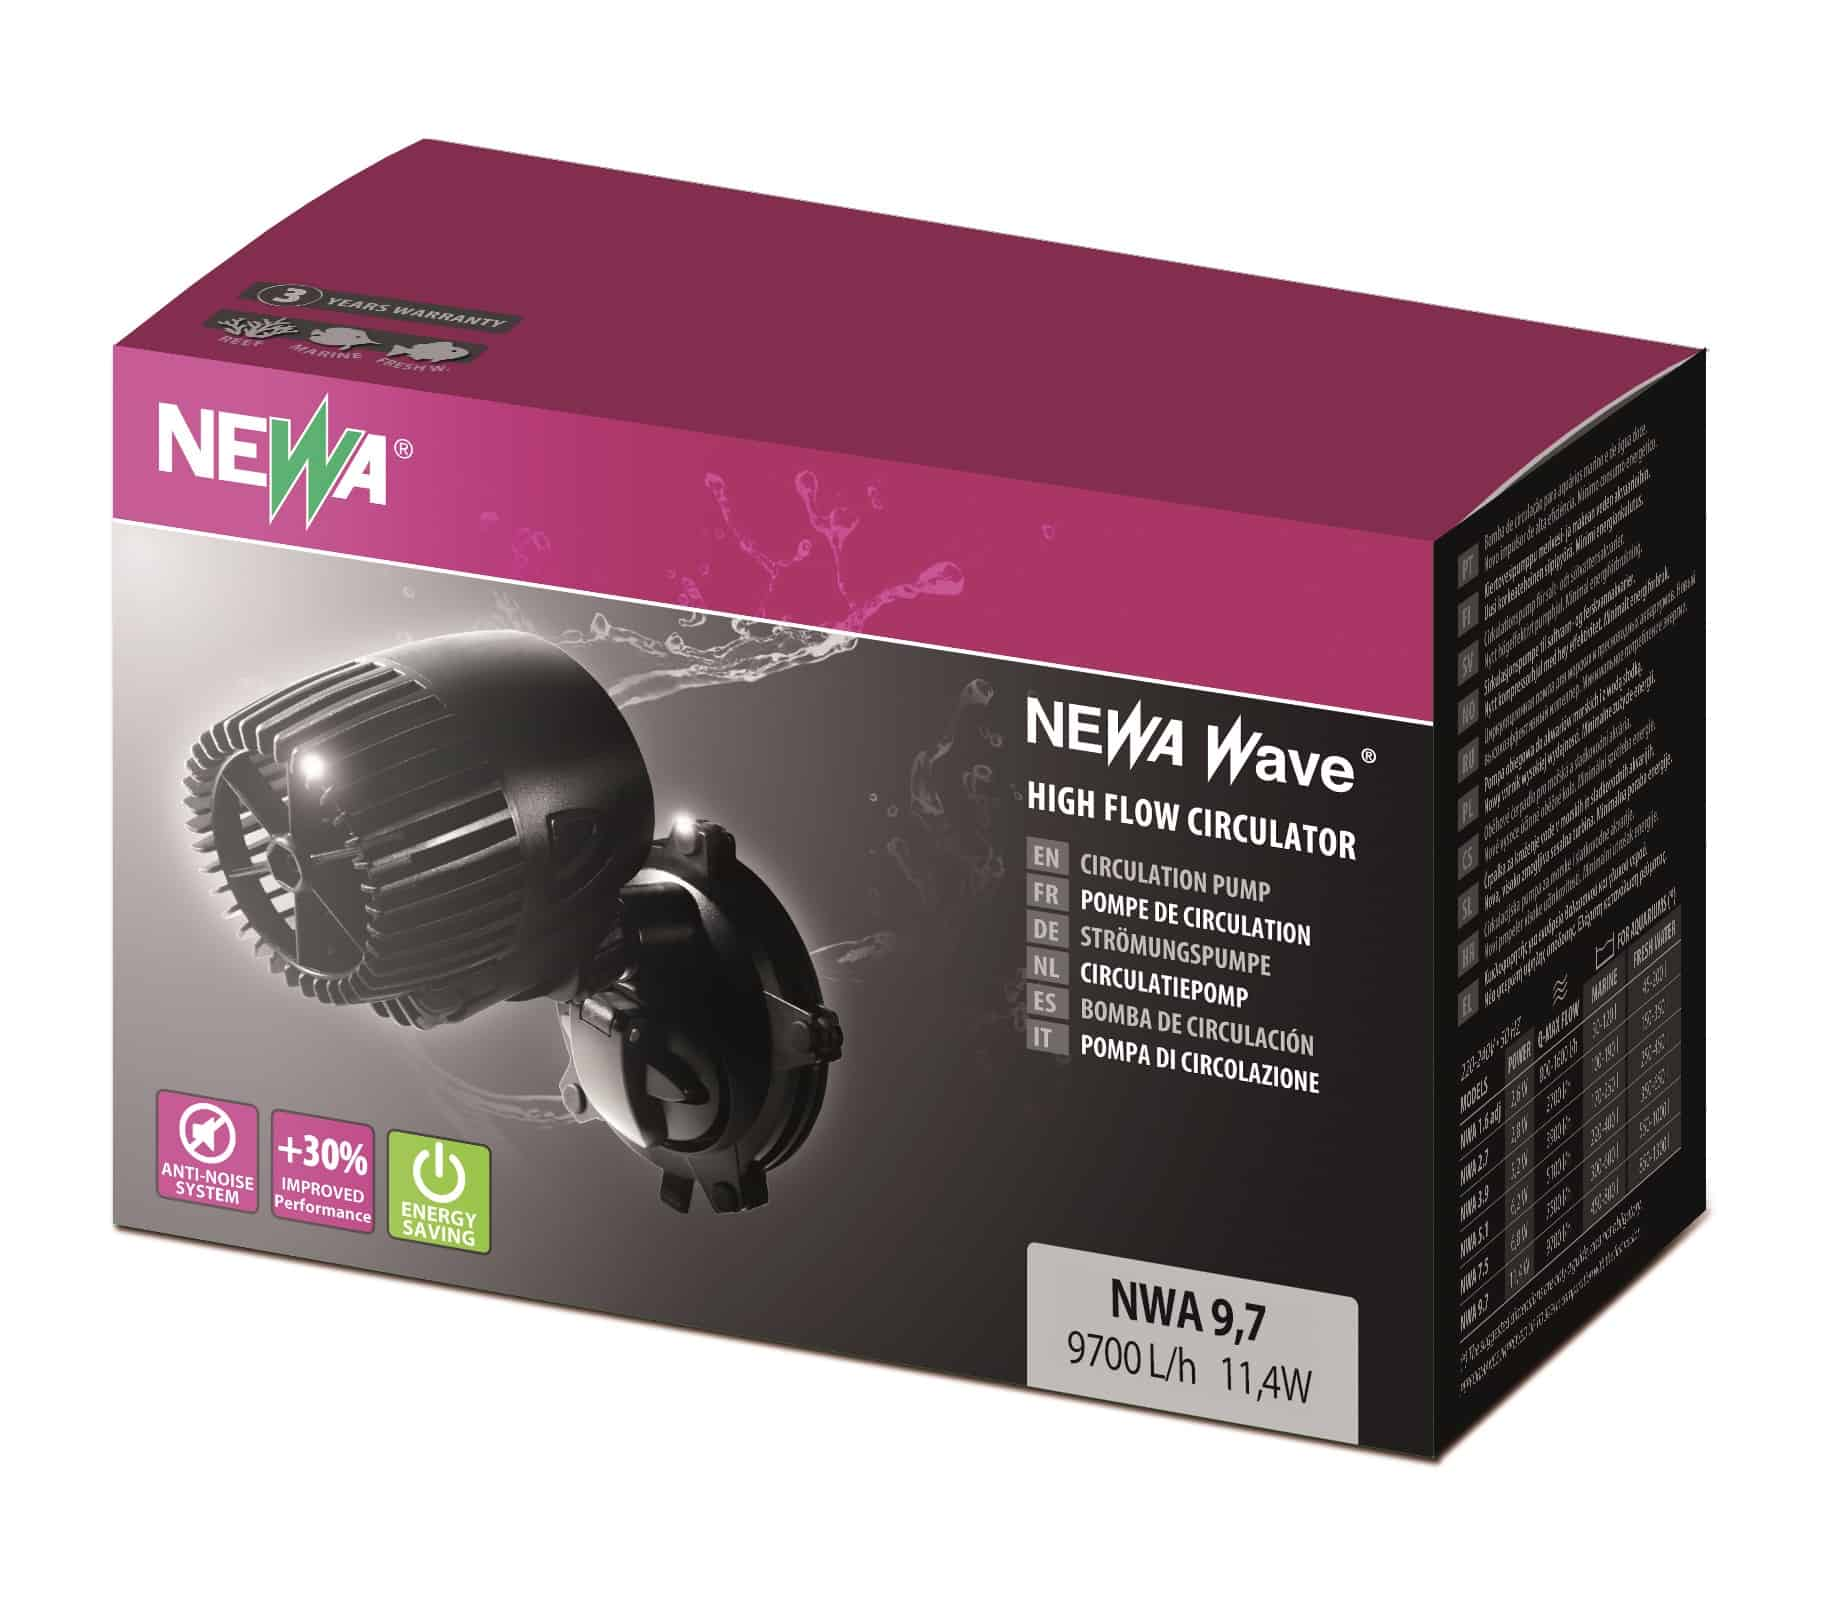 newa-wave-nwa-9-7-pompe-de-brassage-aquarium-min